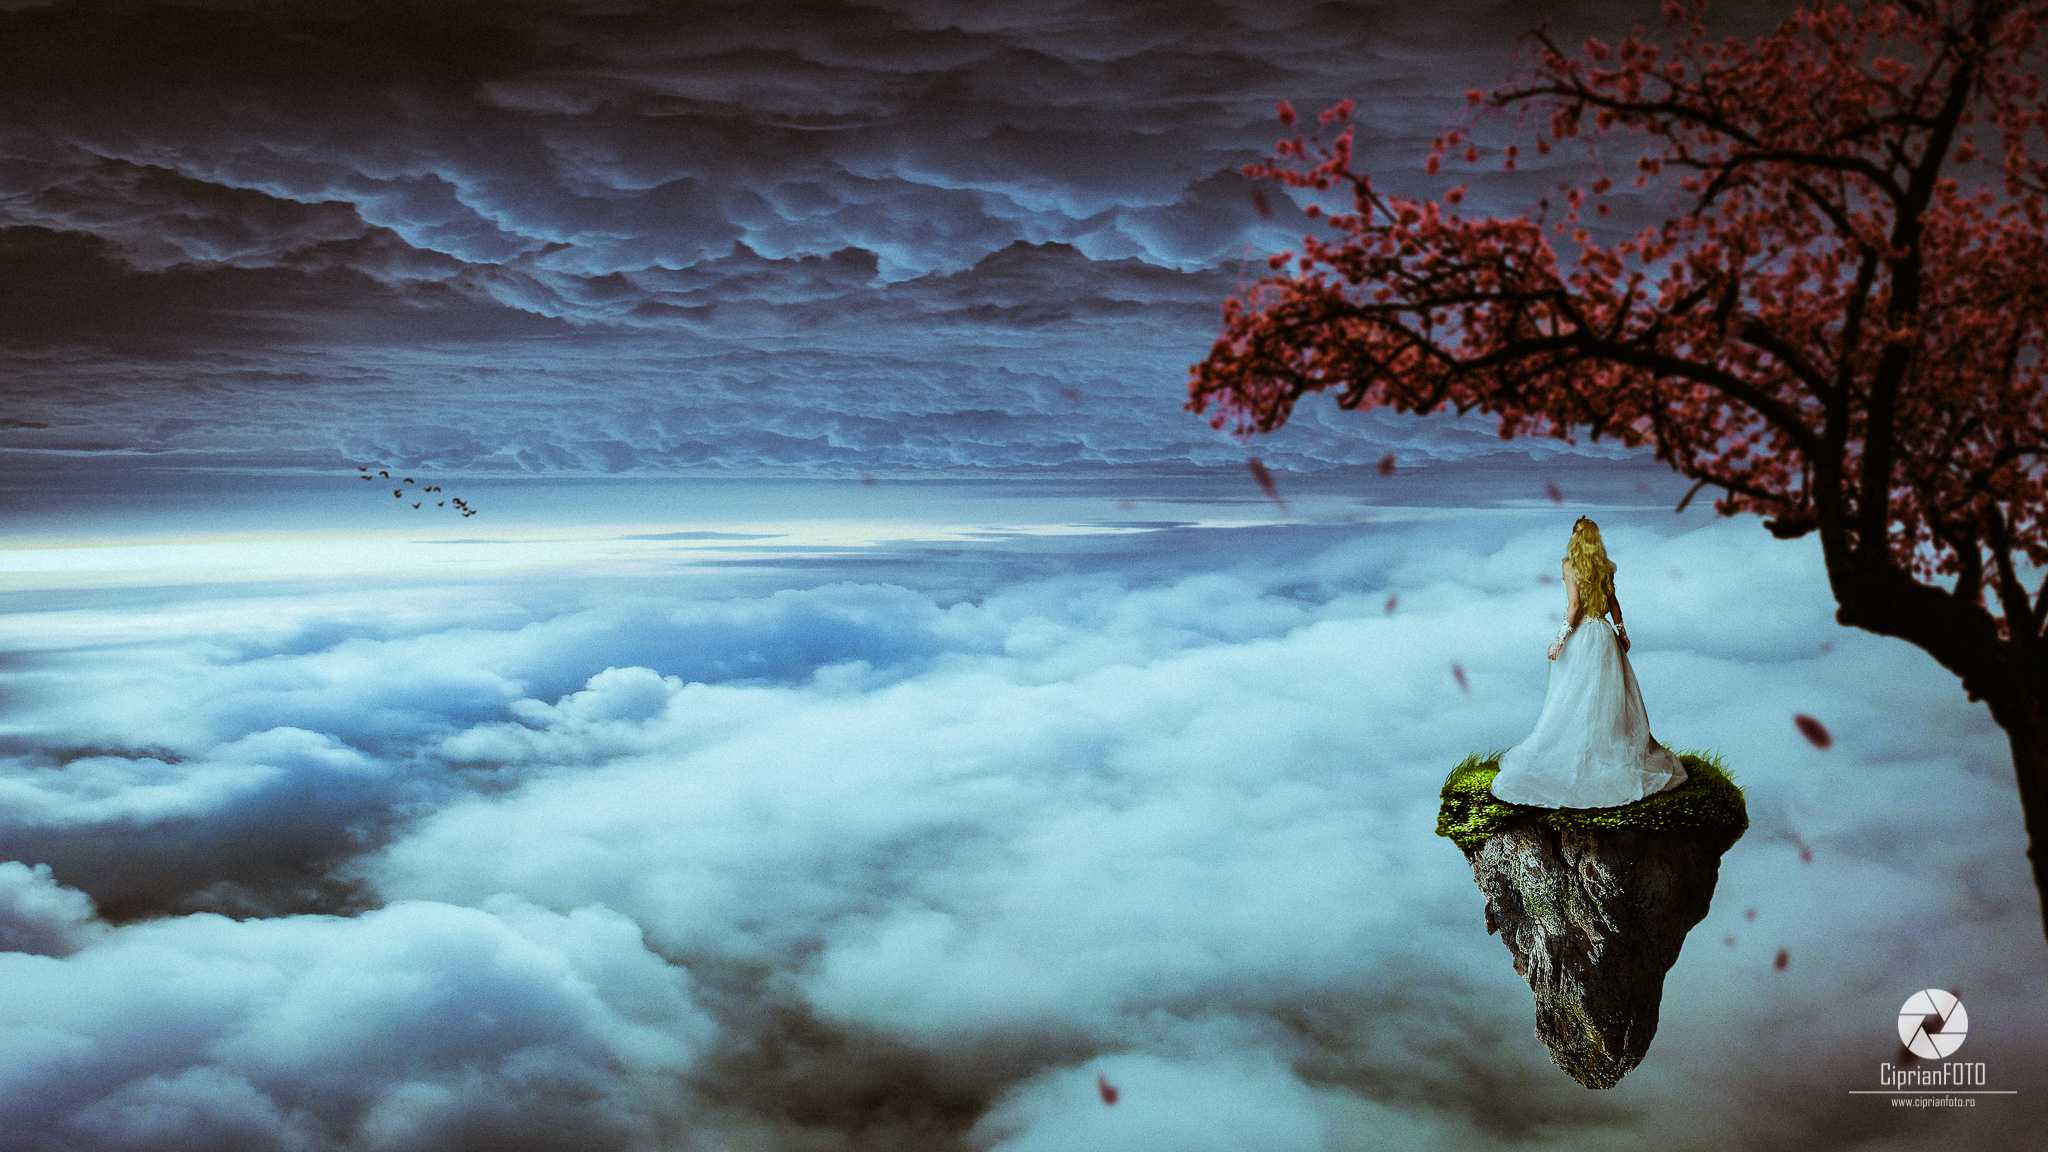 Above The Clouds, Photoshop Manipulation Tutorial, CiprianFOTO